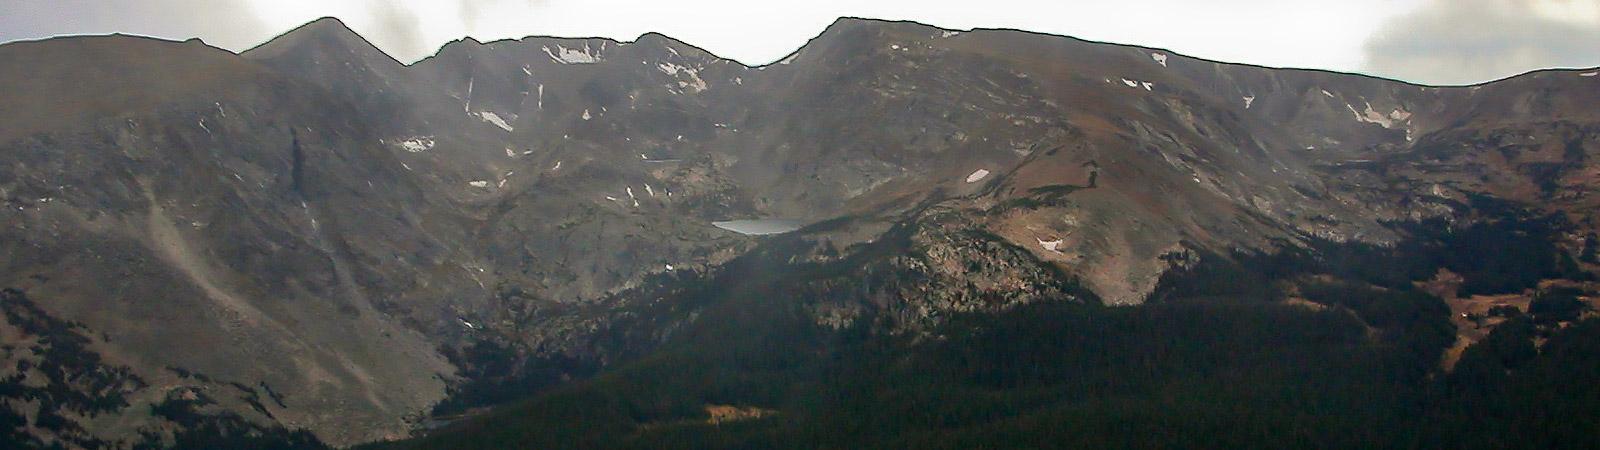 trail ridge canyon overlook 103100122